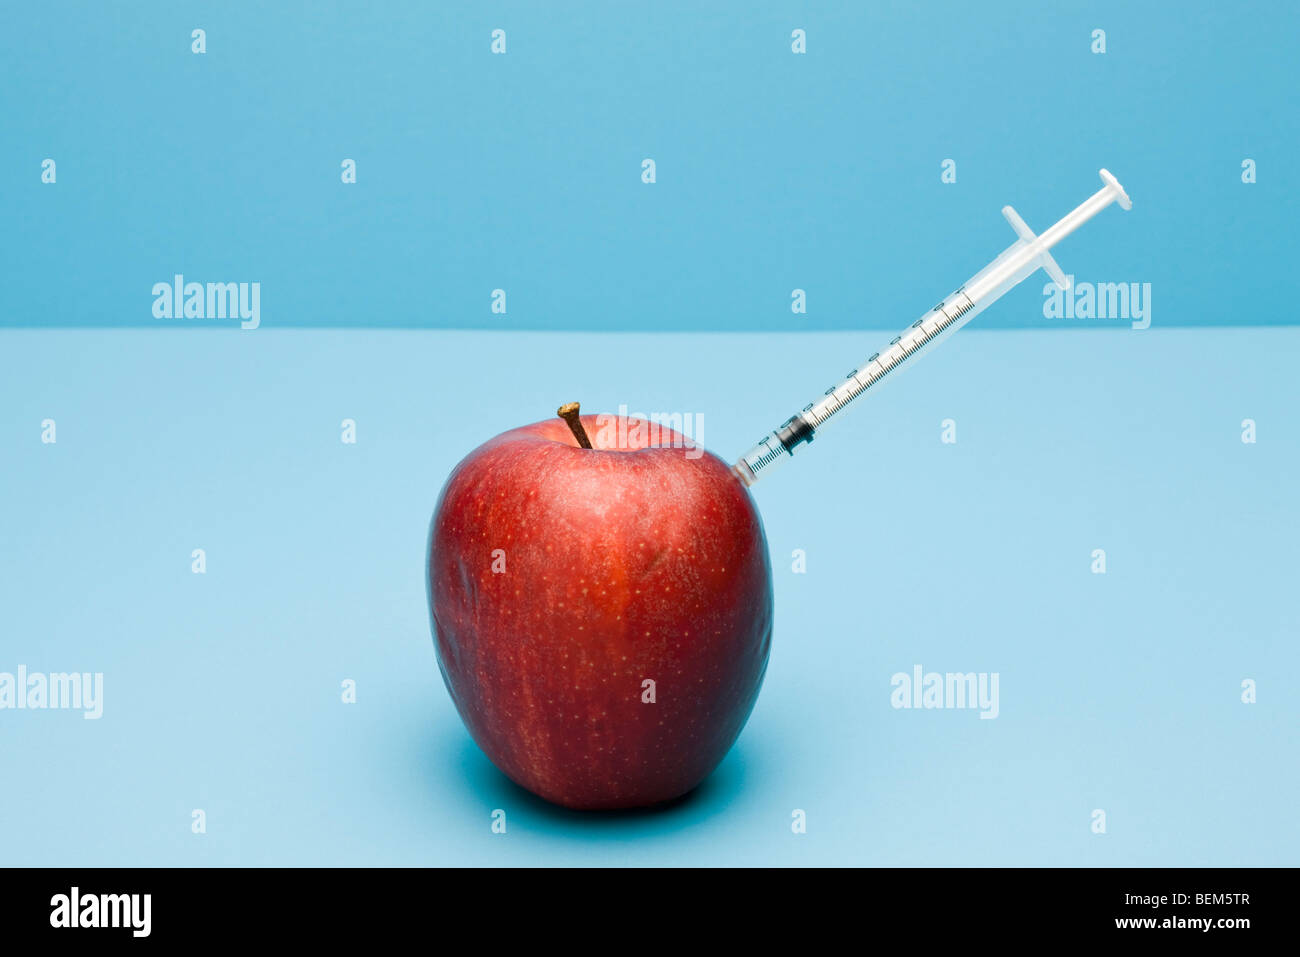 Food-Konzept, Spritze ragte aus Apfel Stockbild